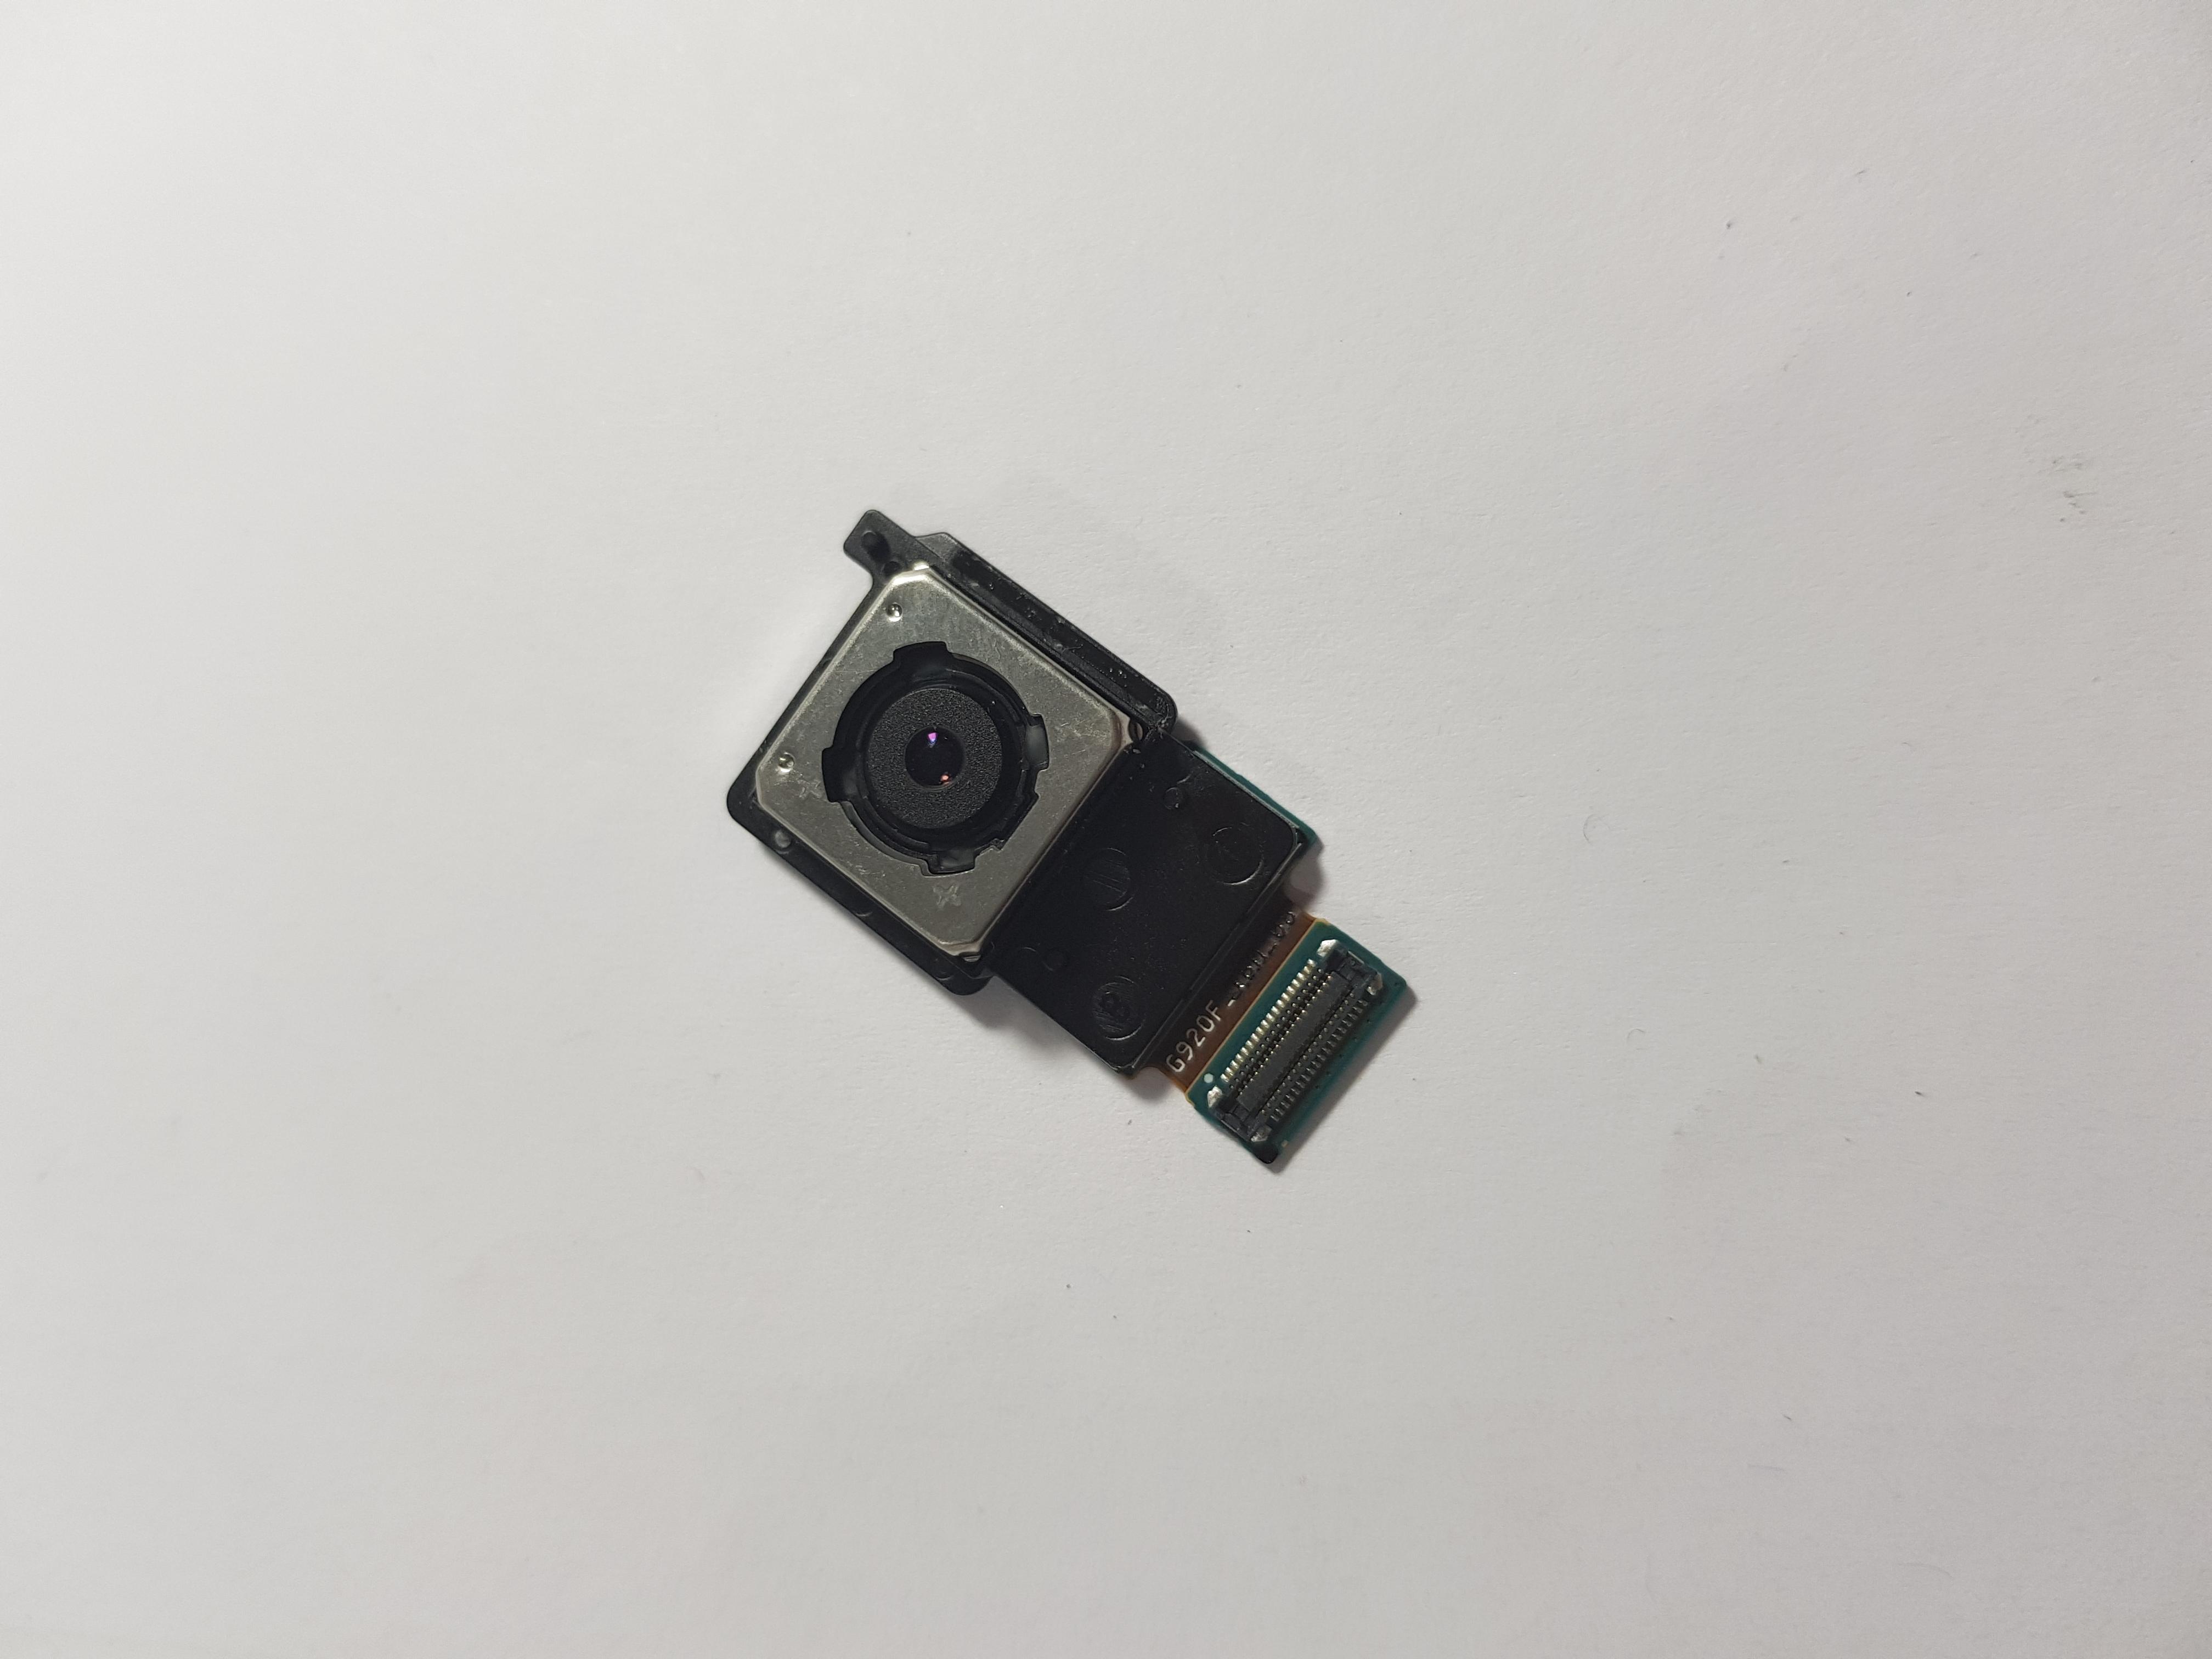 Camera foto principala samsung s6 g920 s6 edge g925 swap originala 0